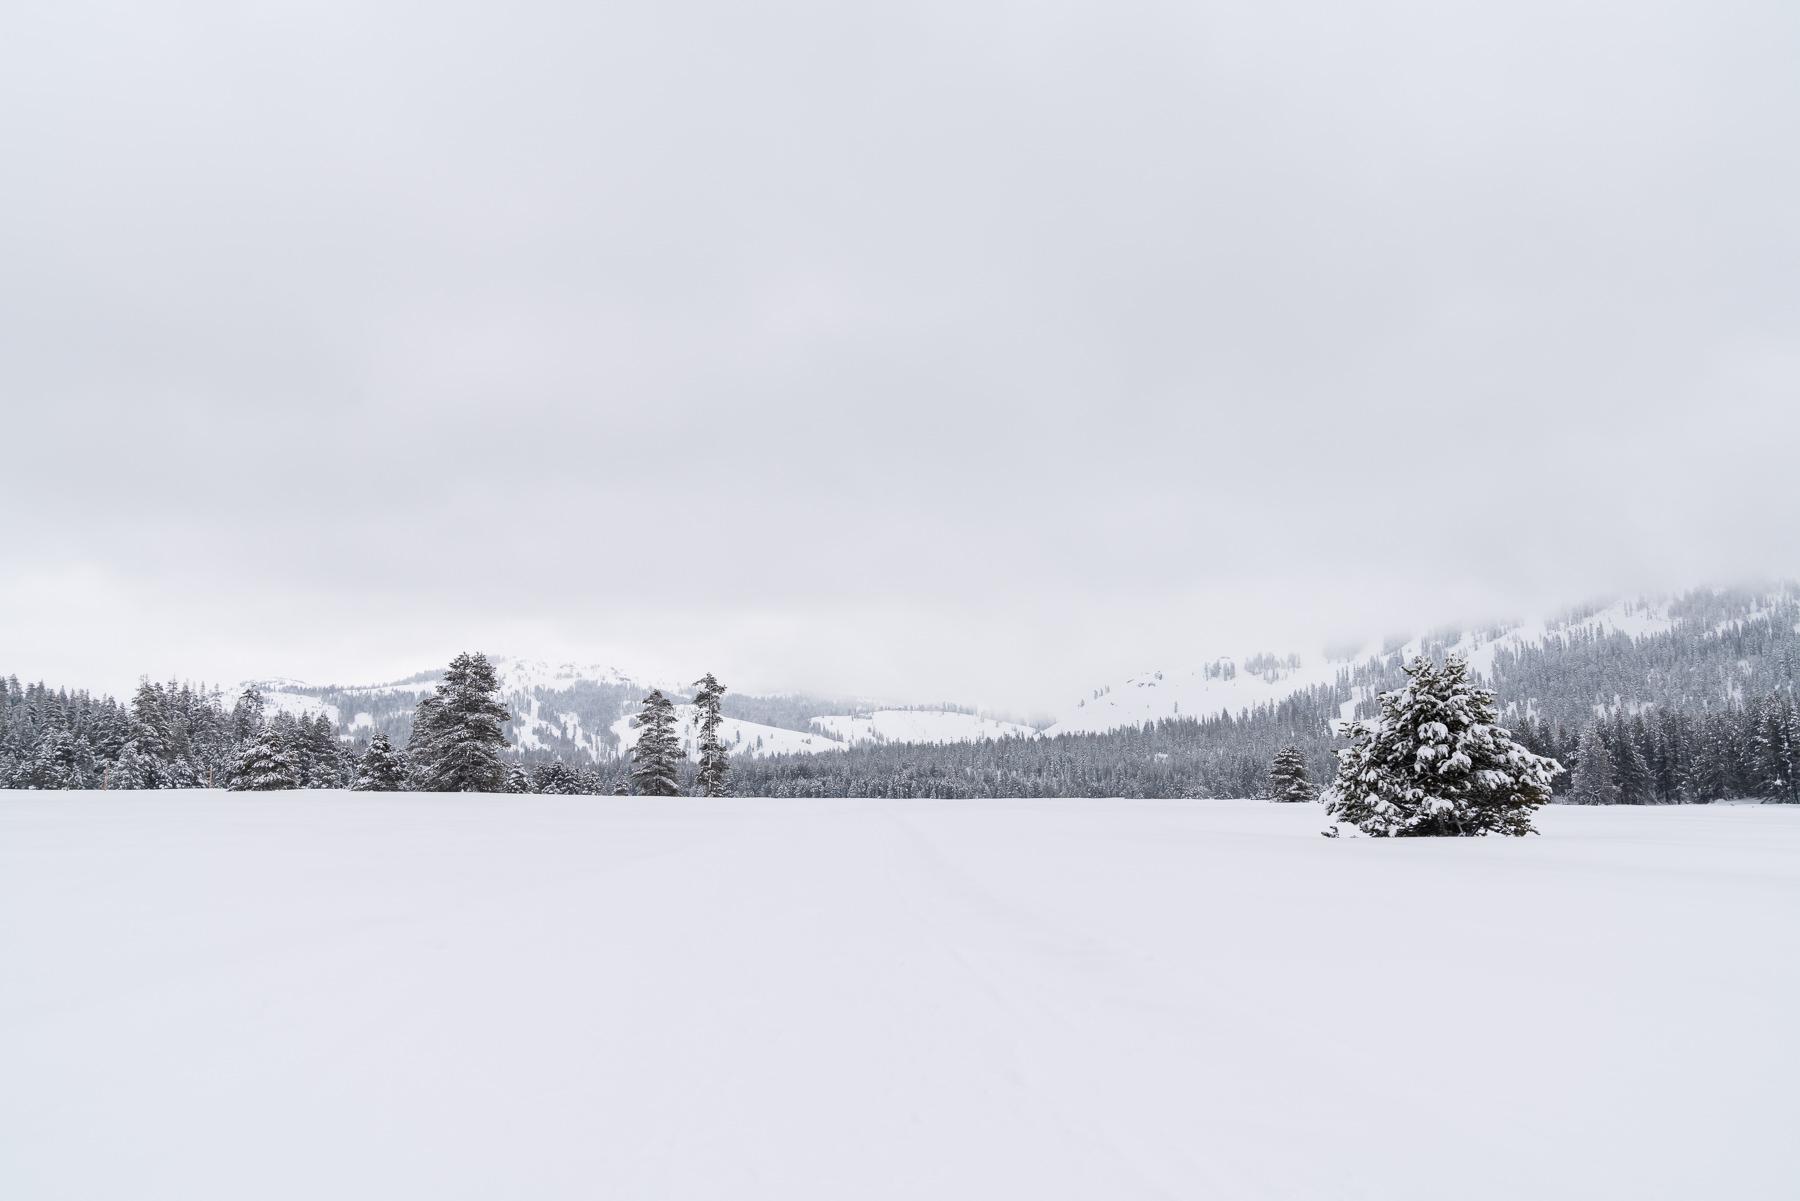 2019.03.23 Snowy Tahoe © Jennifer Carr Photography-24.jpg